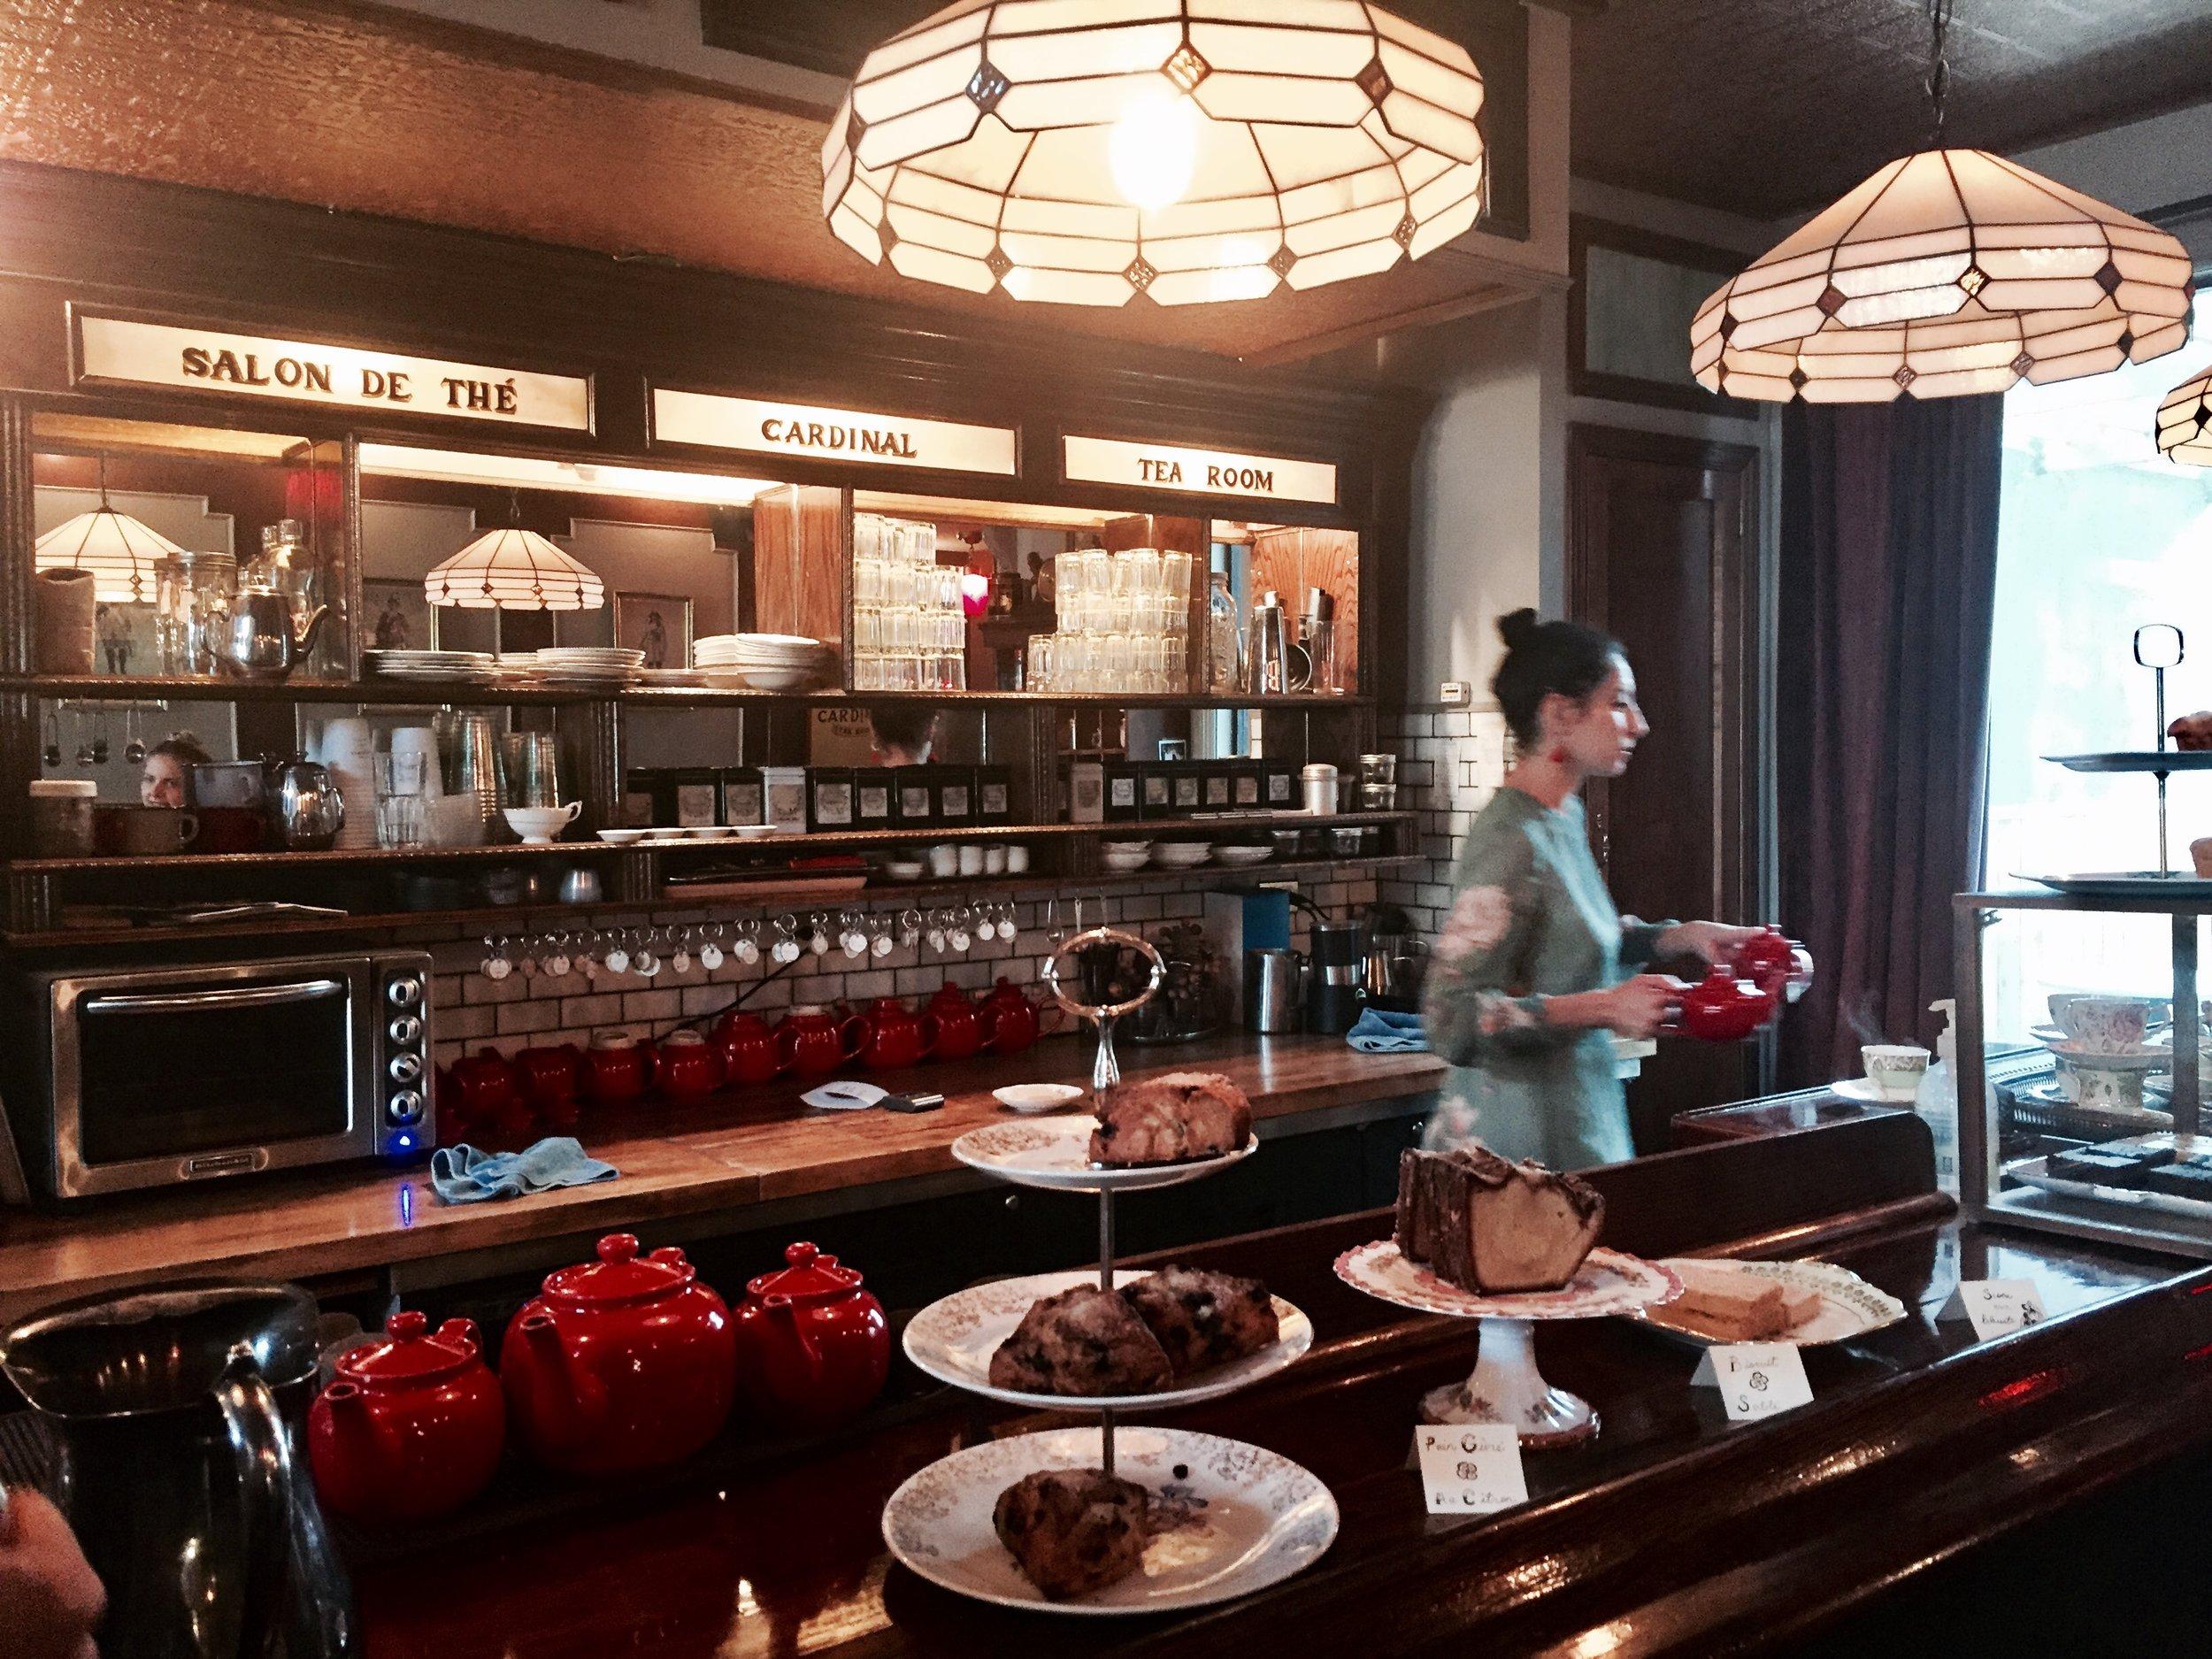 Cardinal tearoom